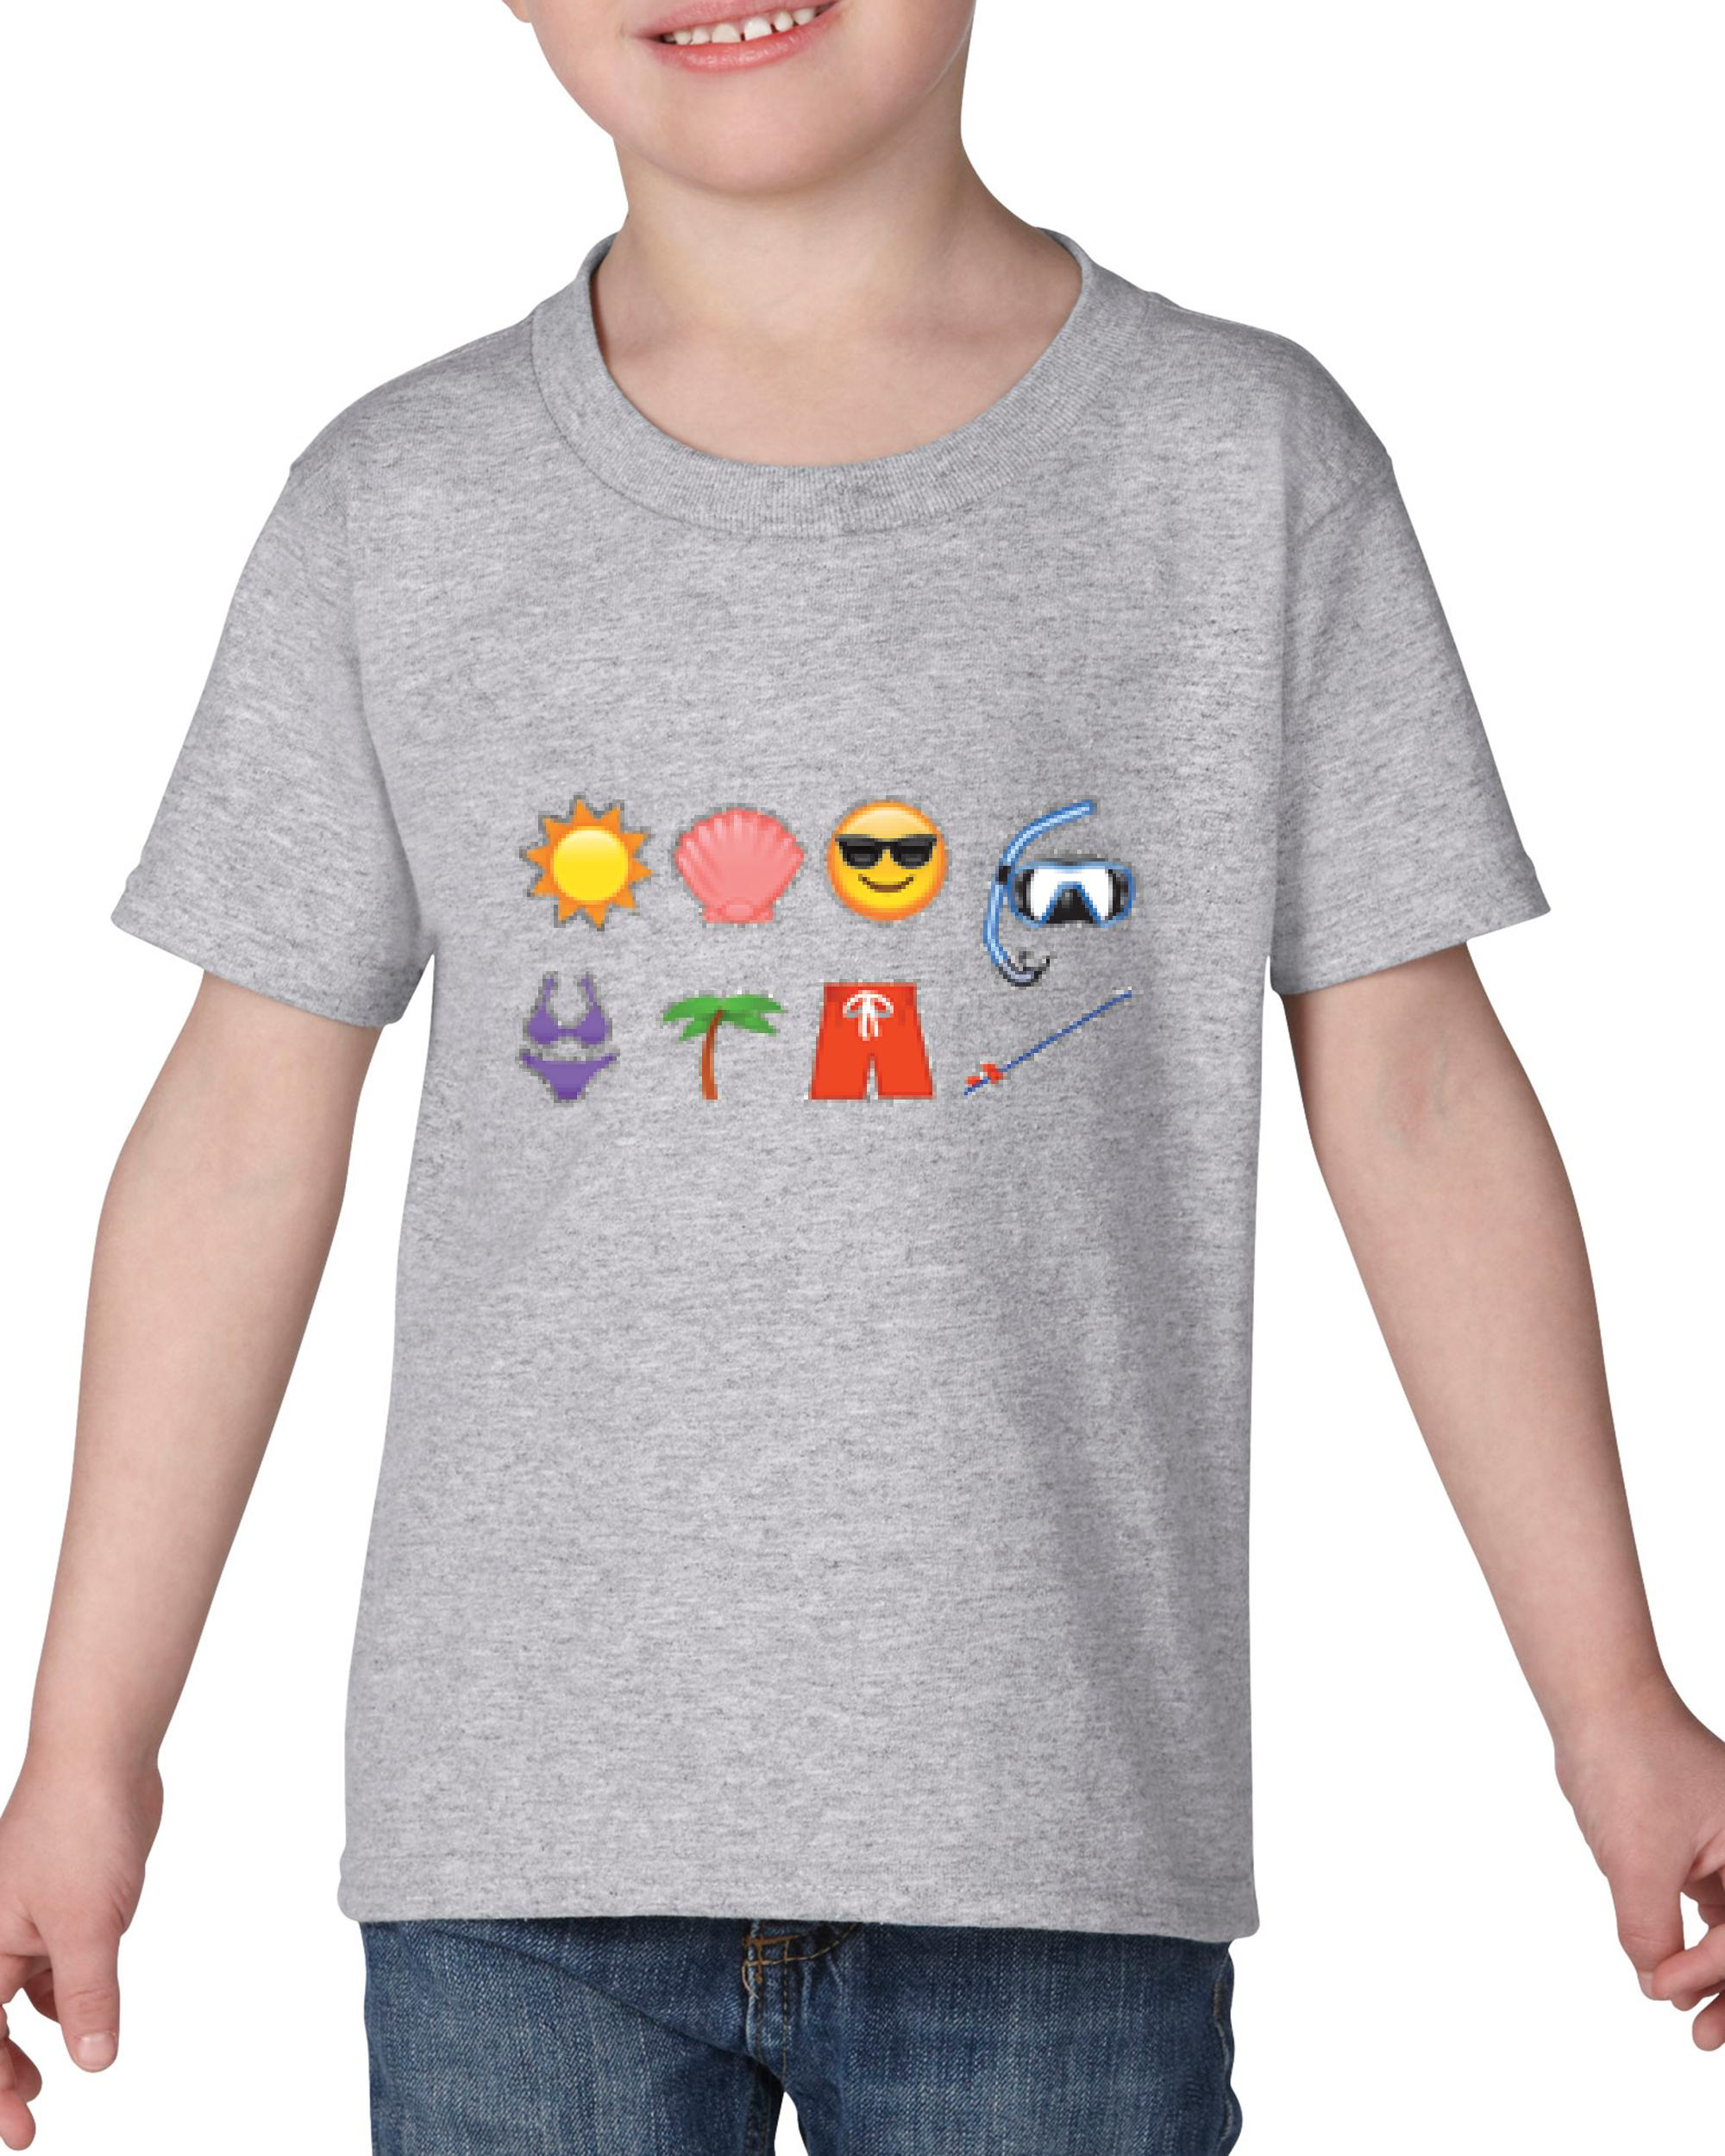 Artix Emojis Beach / Sea Items Emojis Beach Sea Items  Christmas Birthday Gift Match W Hats Bags Jeans Leggings Heavy Cotton Toddler Kids T-Shirt Tee Clothing